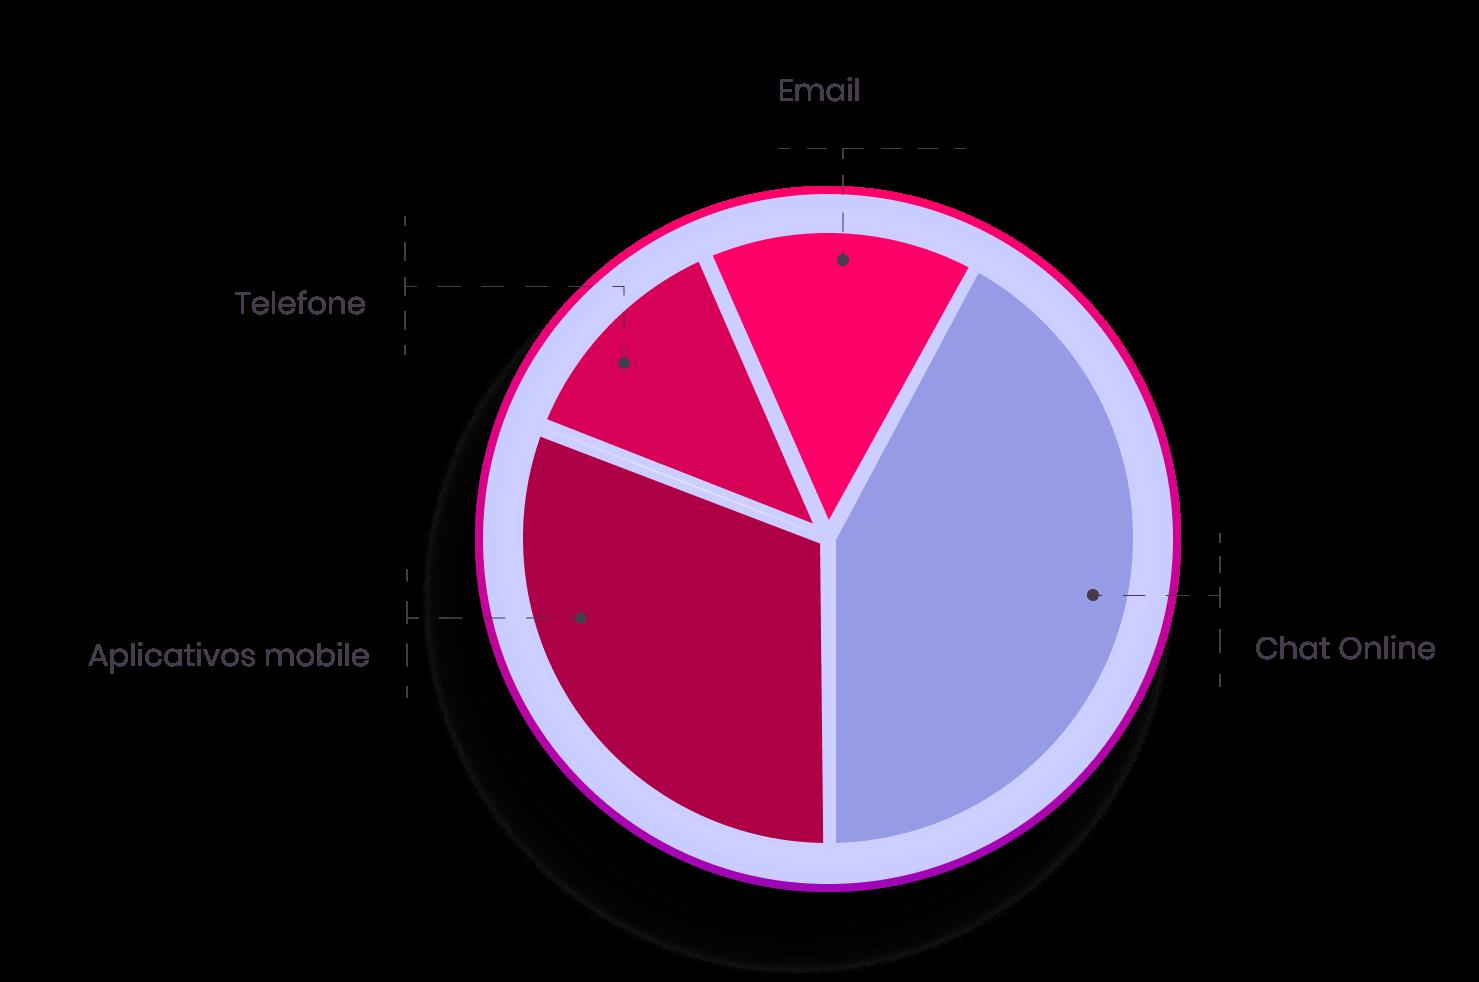 Resultado da pesquisa (Fonte: Global Contact Centre Benchmarking)